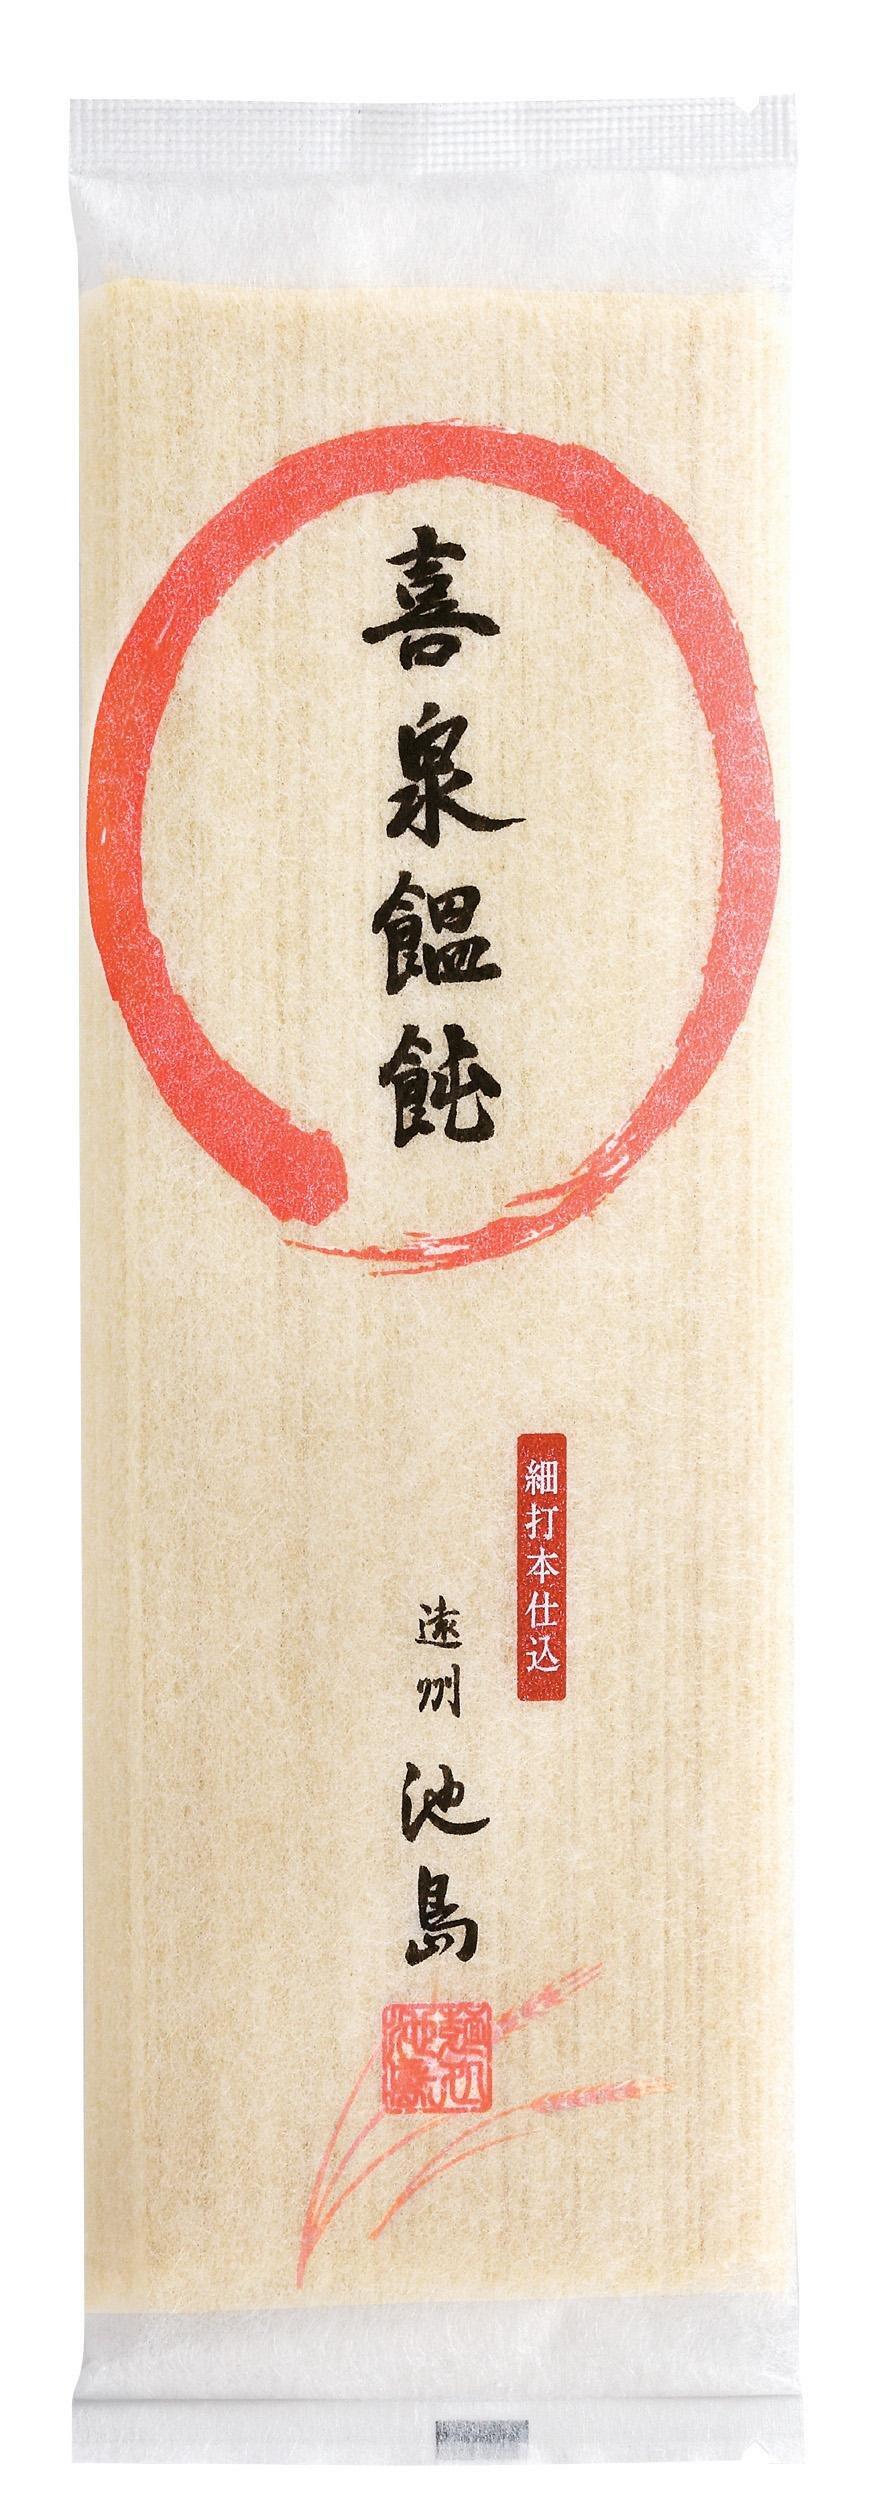 Ikeshima Hee Izumi Udon 180gX10 pieces